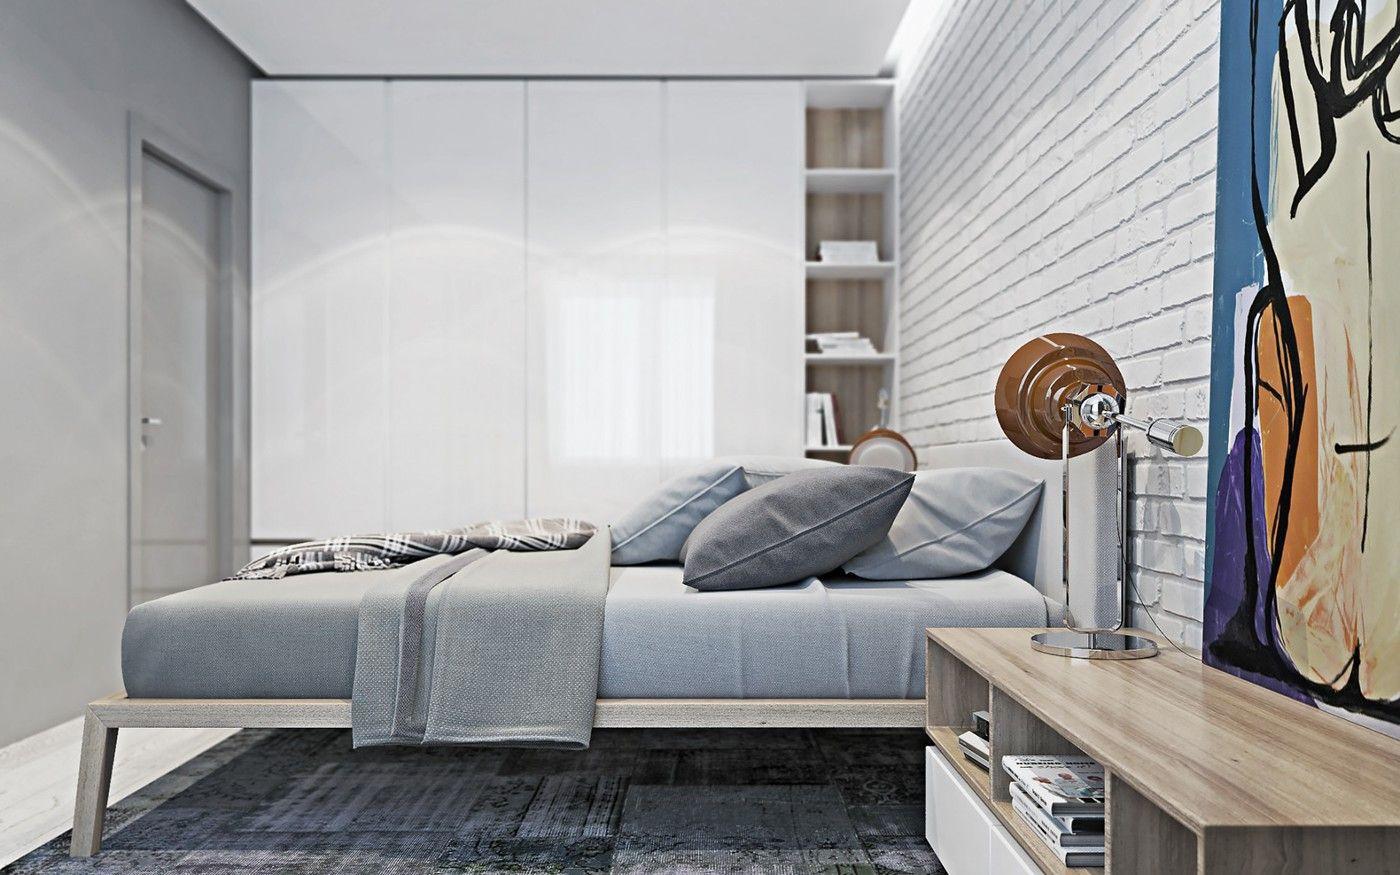 Kozatskiy apartment on Behance Residential interior